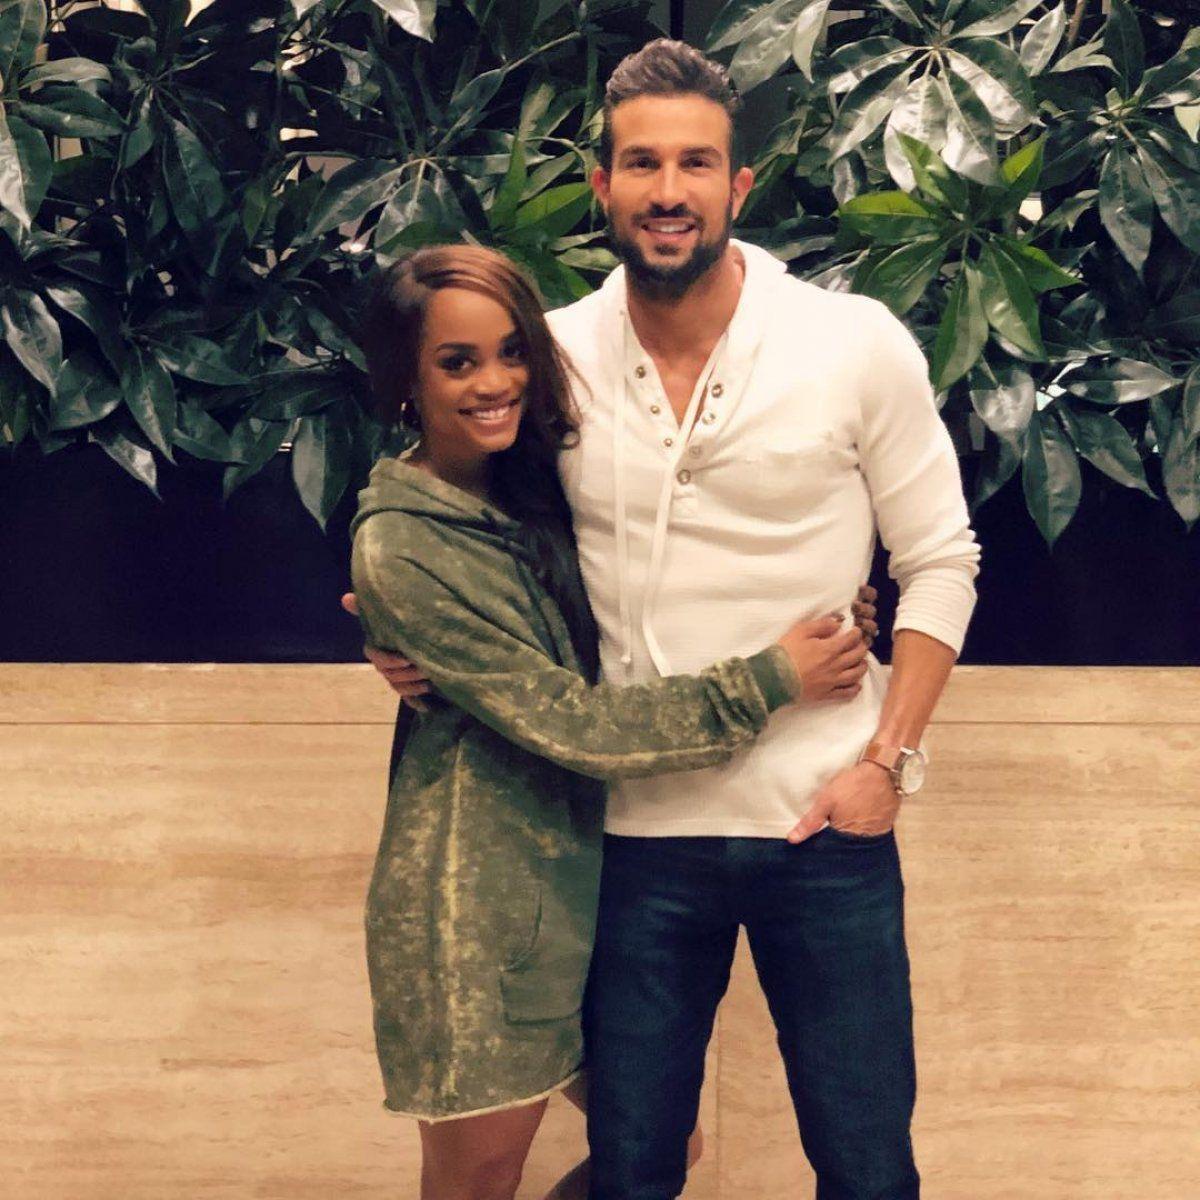 Bachelorette Rachel: 'The Bachelorette' Star Rachel Lindsay Talks Bryan Abasolo